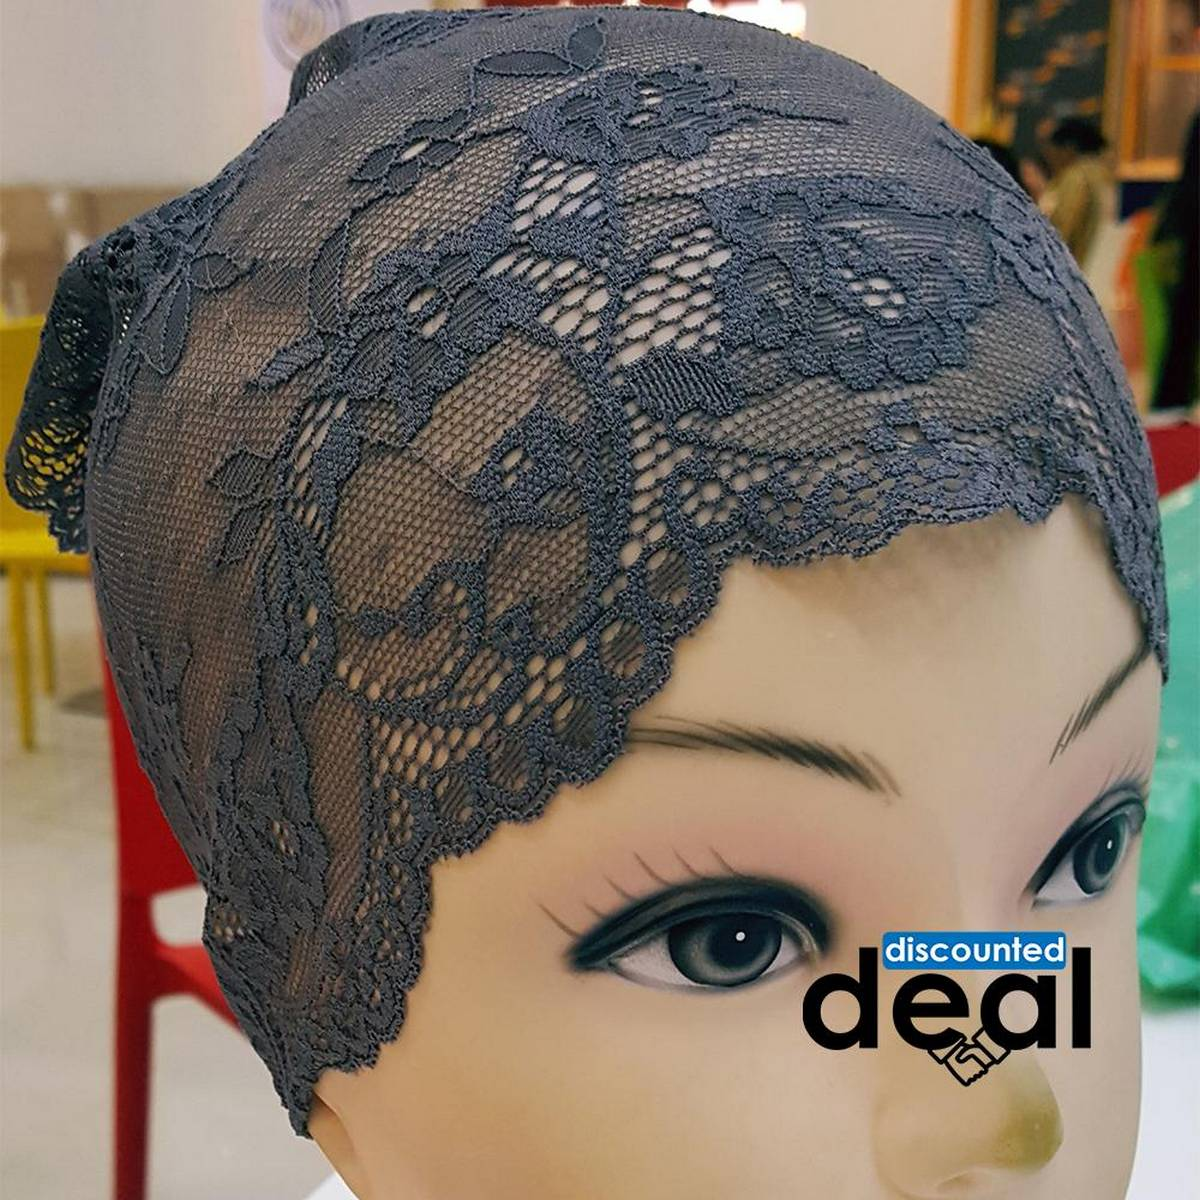 lace net Grey Muslim Headscarf Inner Hijab Caps Wraps Women Islamic Under Scarf Ninja Scarf Ramadan Stretch Cotton Bonnet Caps